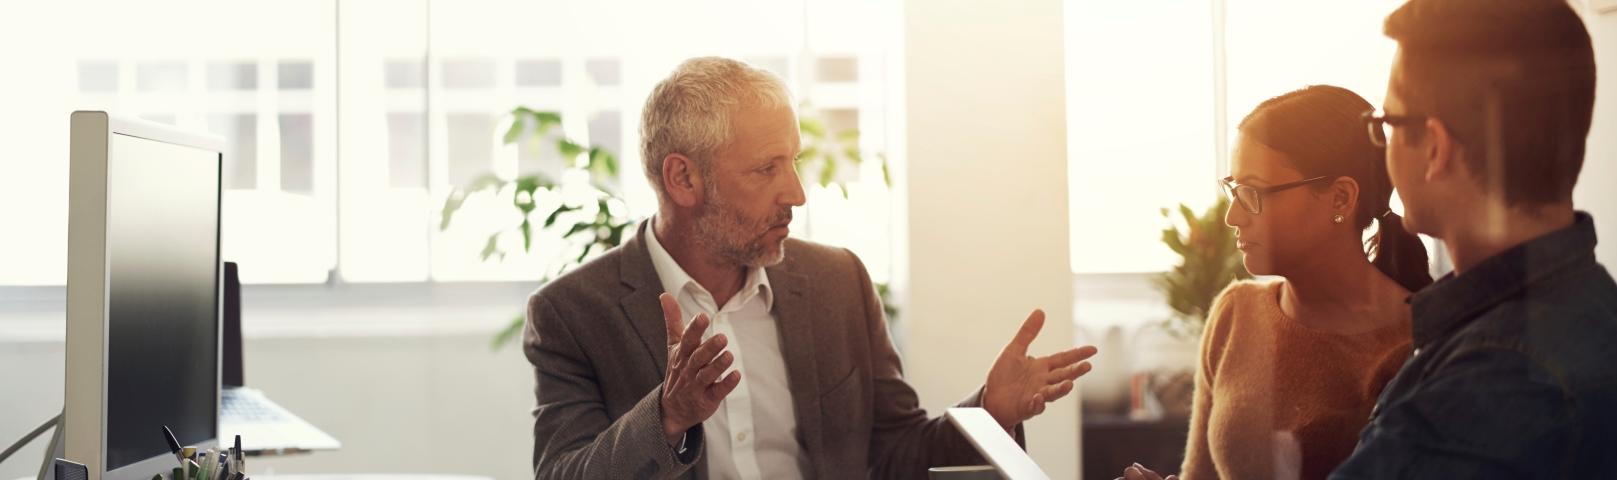 Man talking in board room meeting